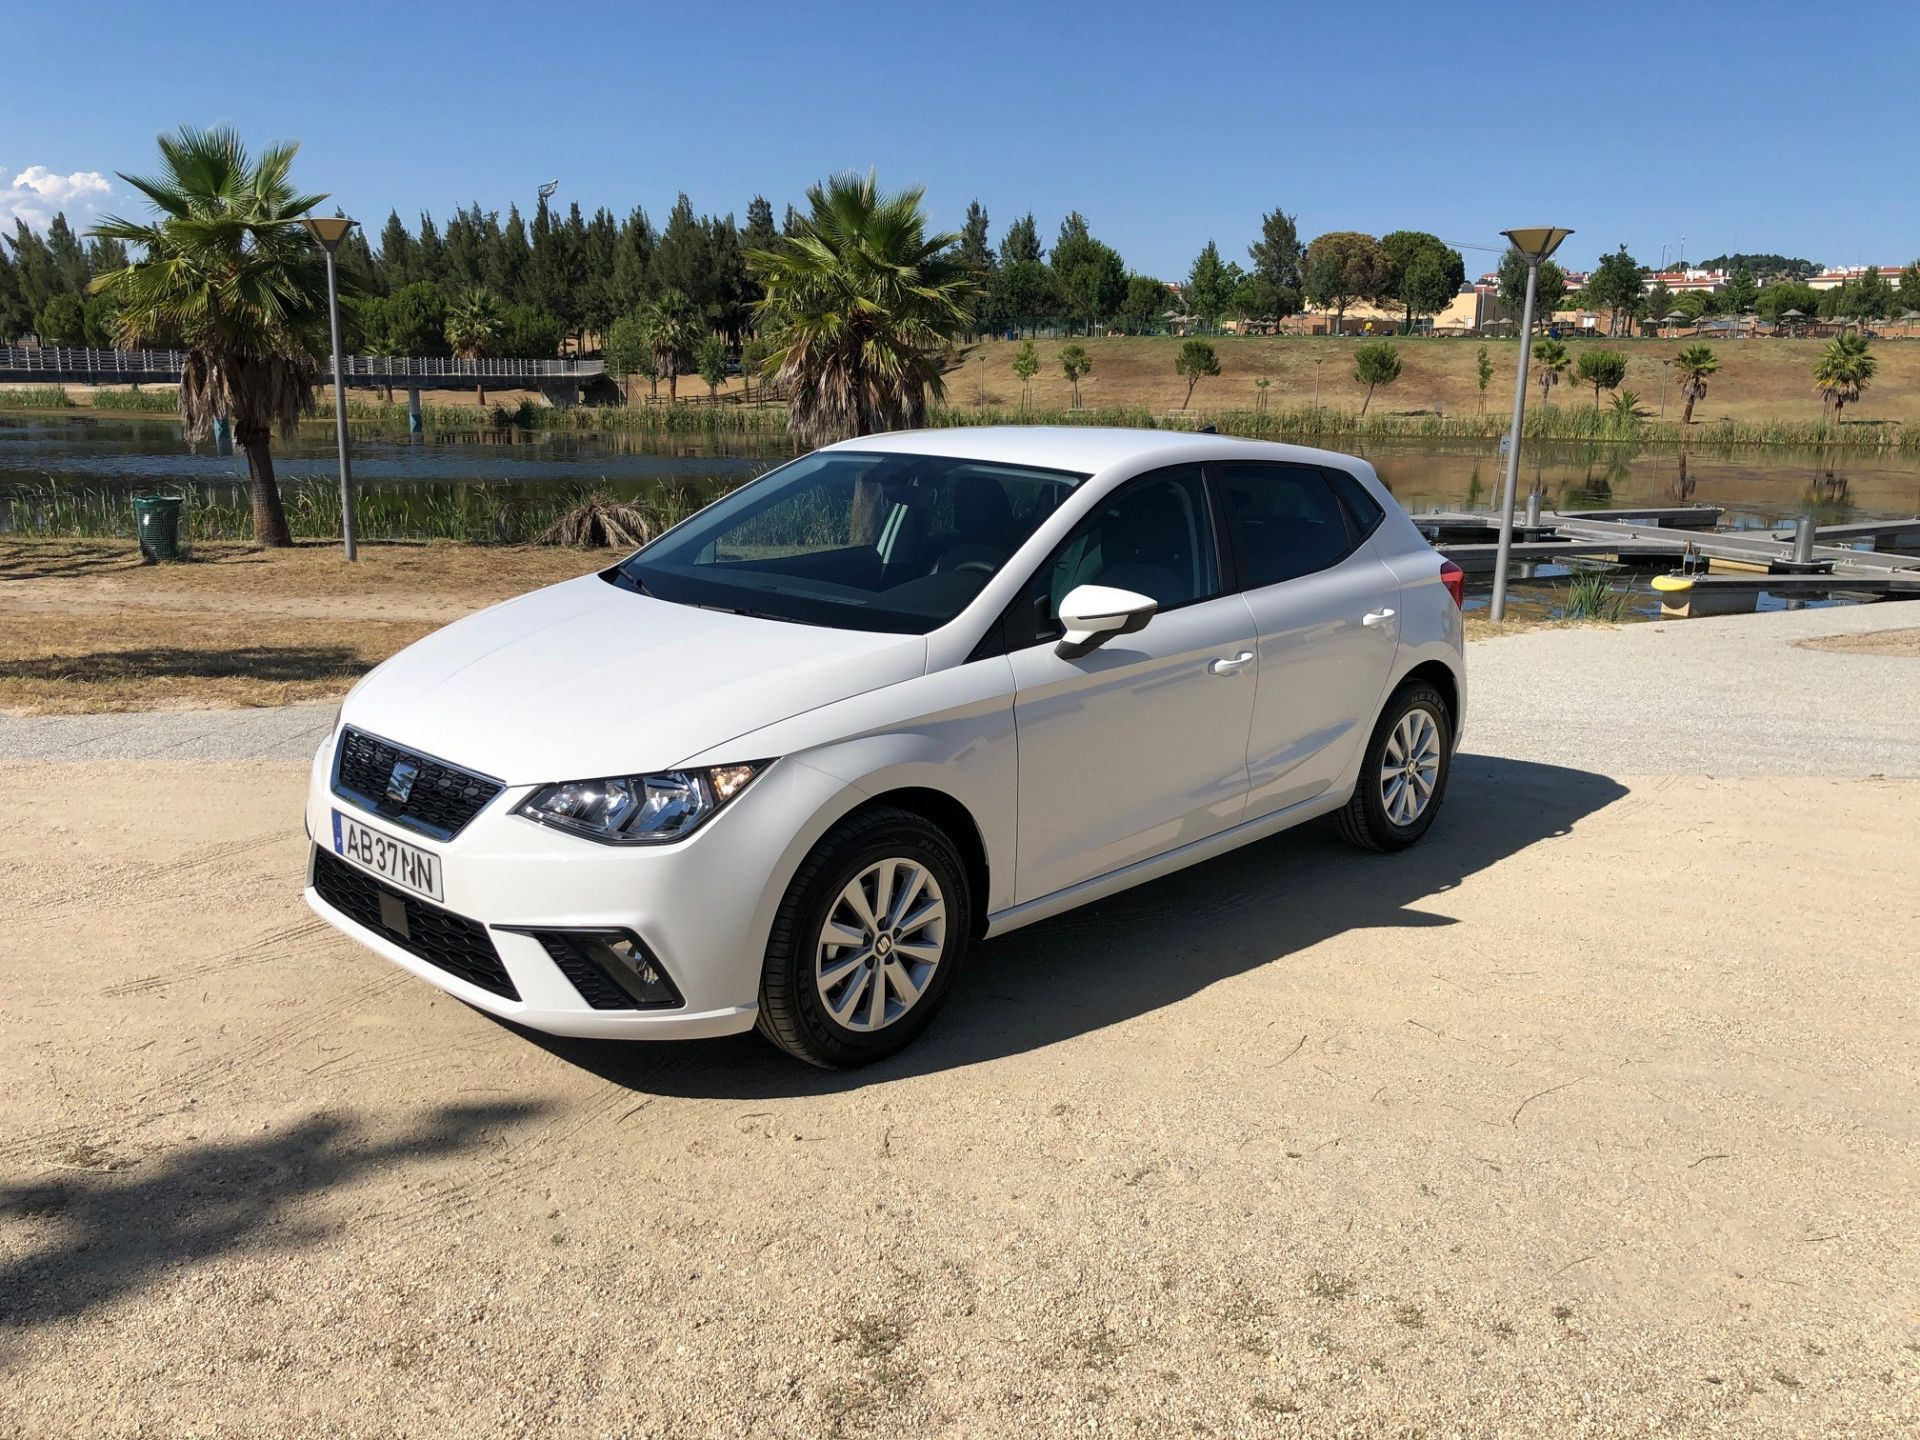 SEAT Ibiza 1.0 TSI STYLE 5v usada Castelo Branco